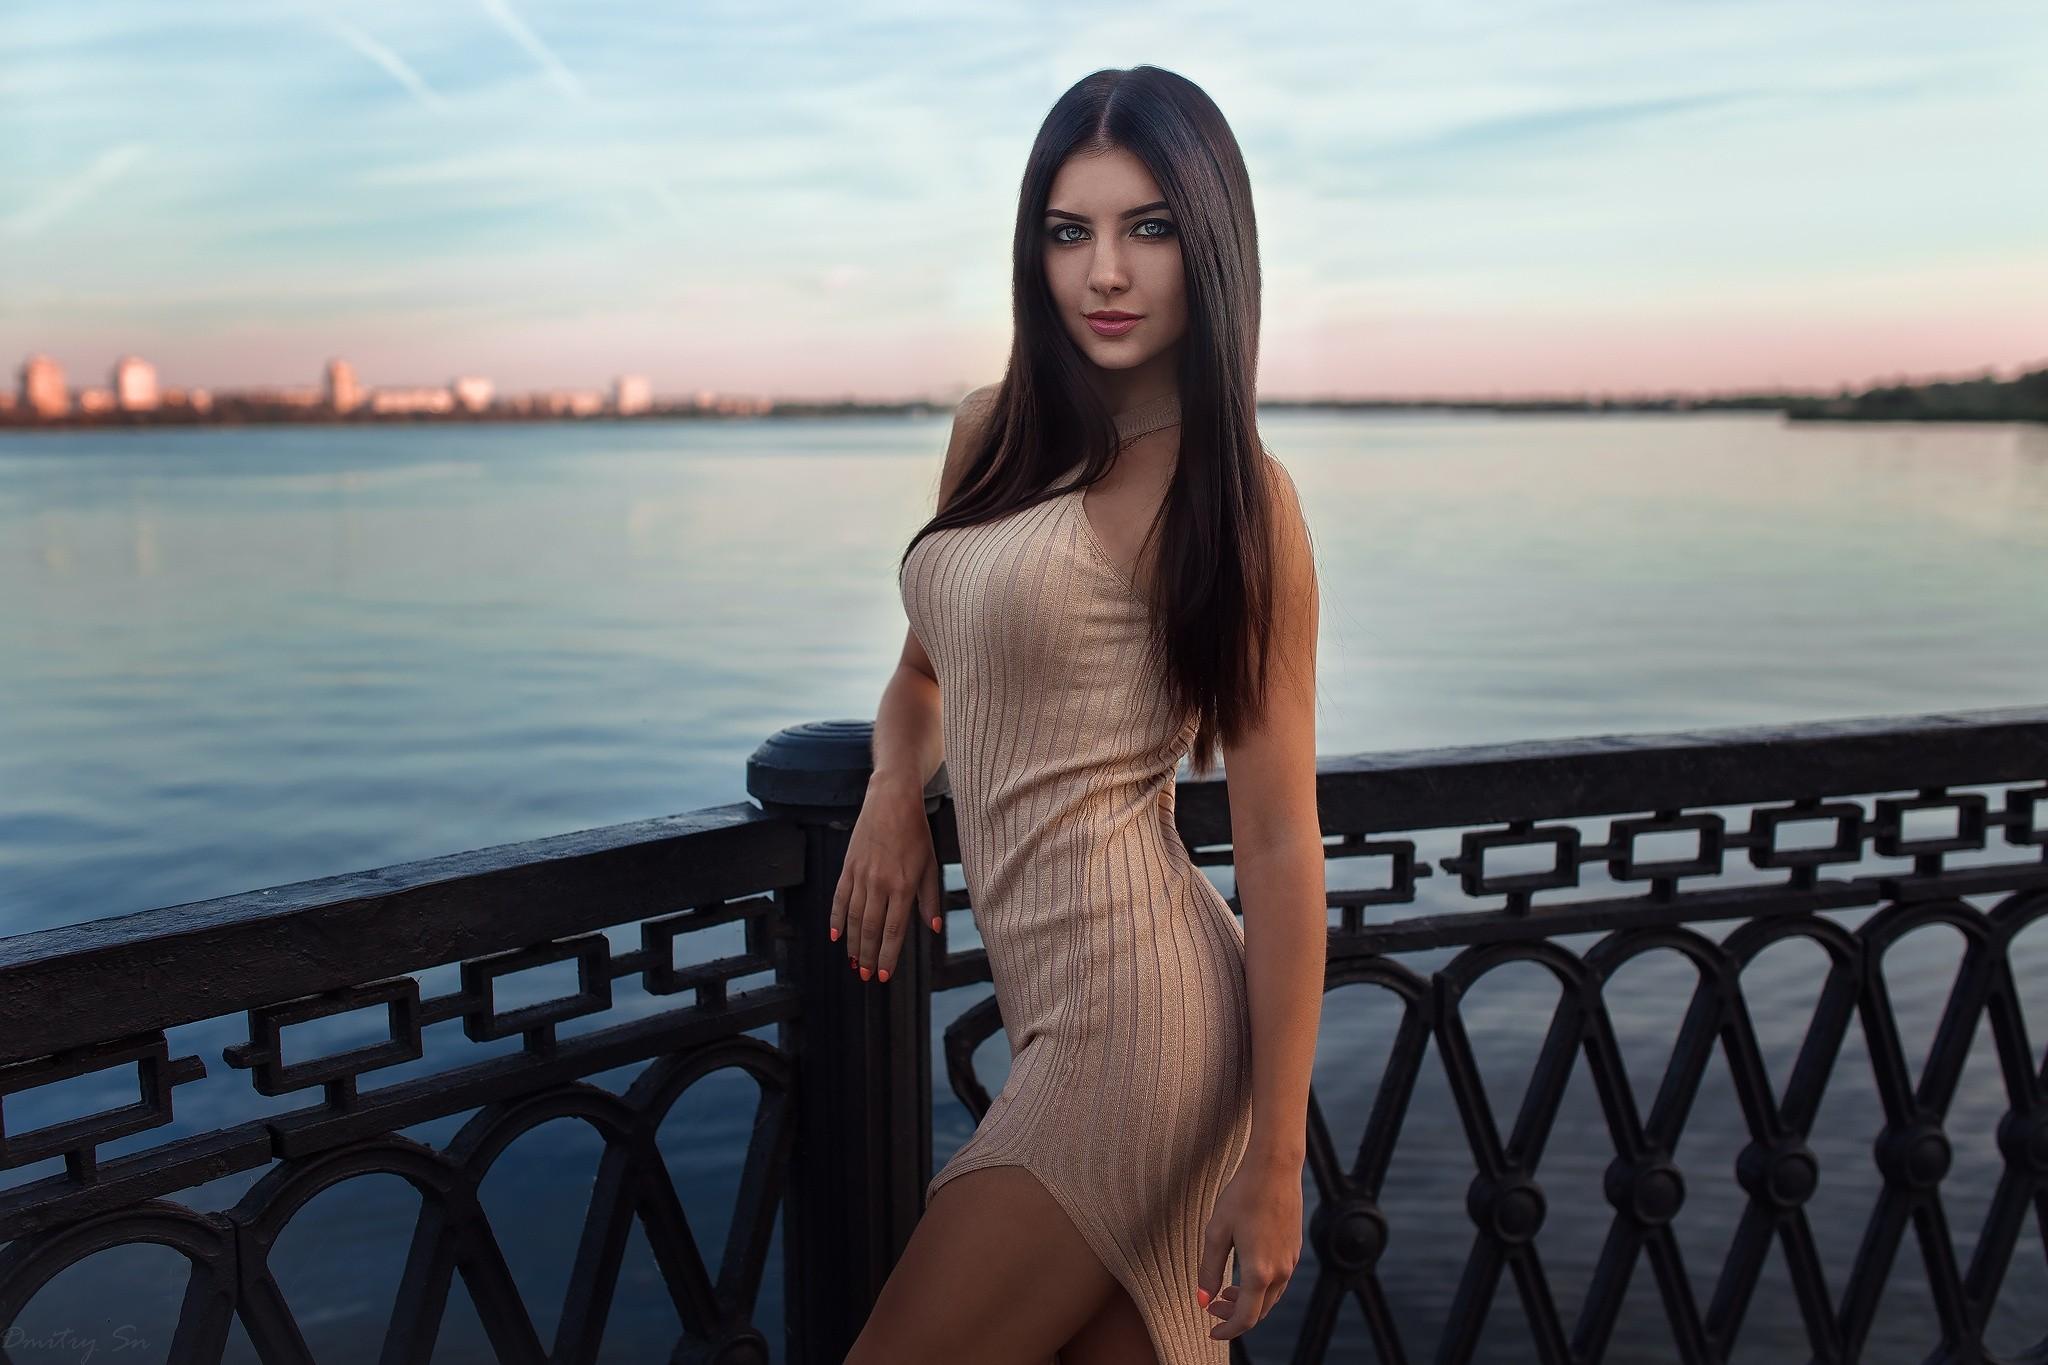 Russian Singles Date Sunday